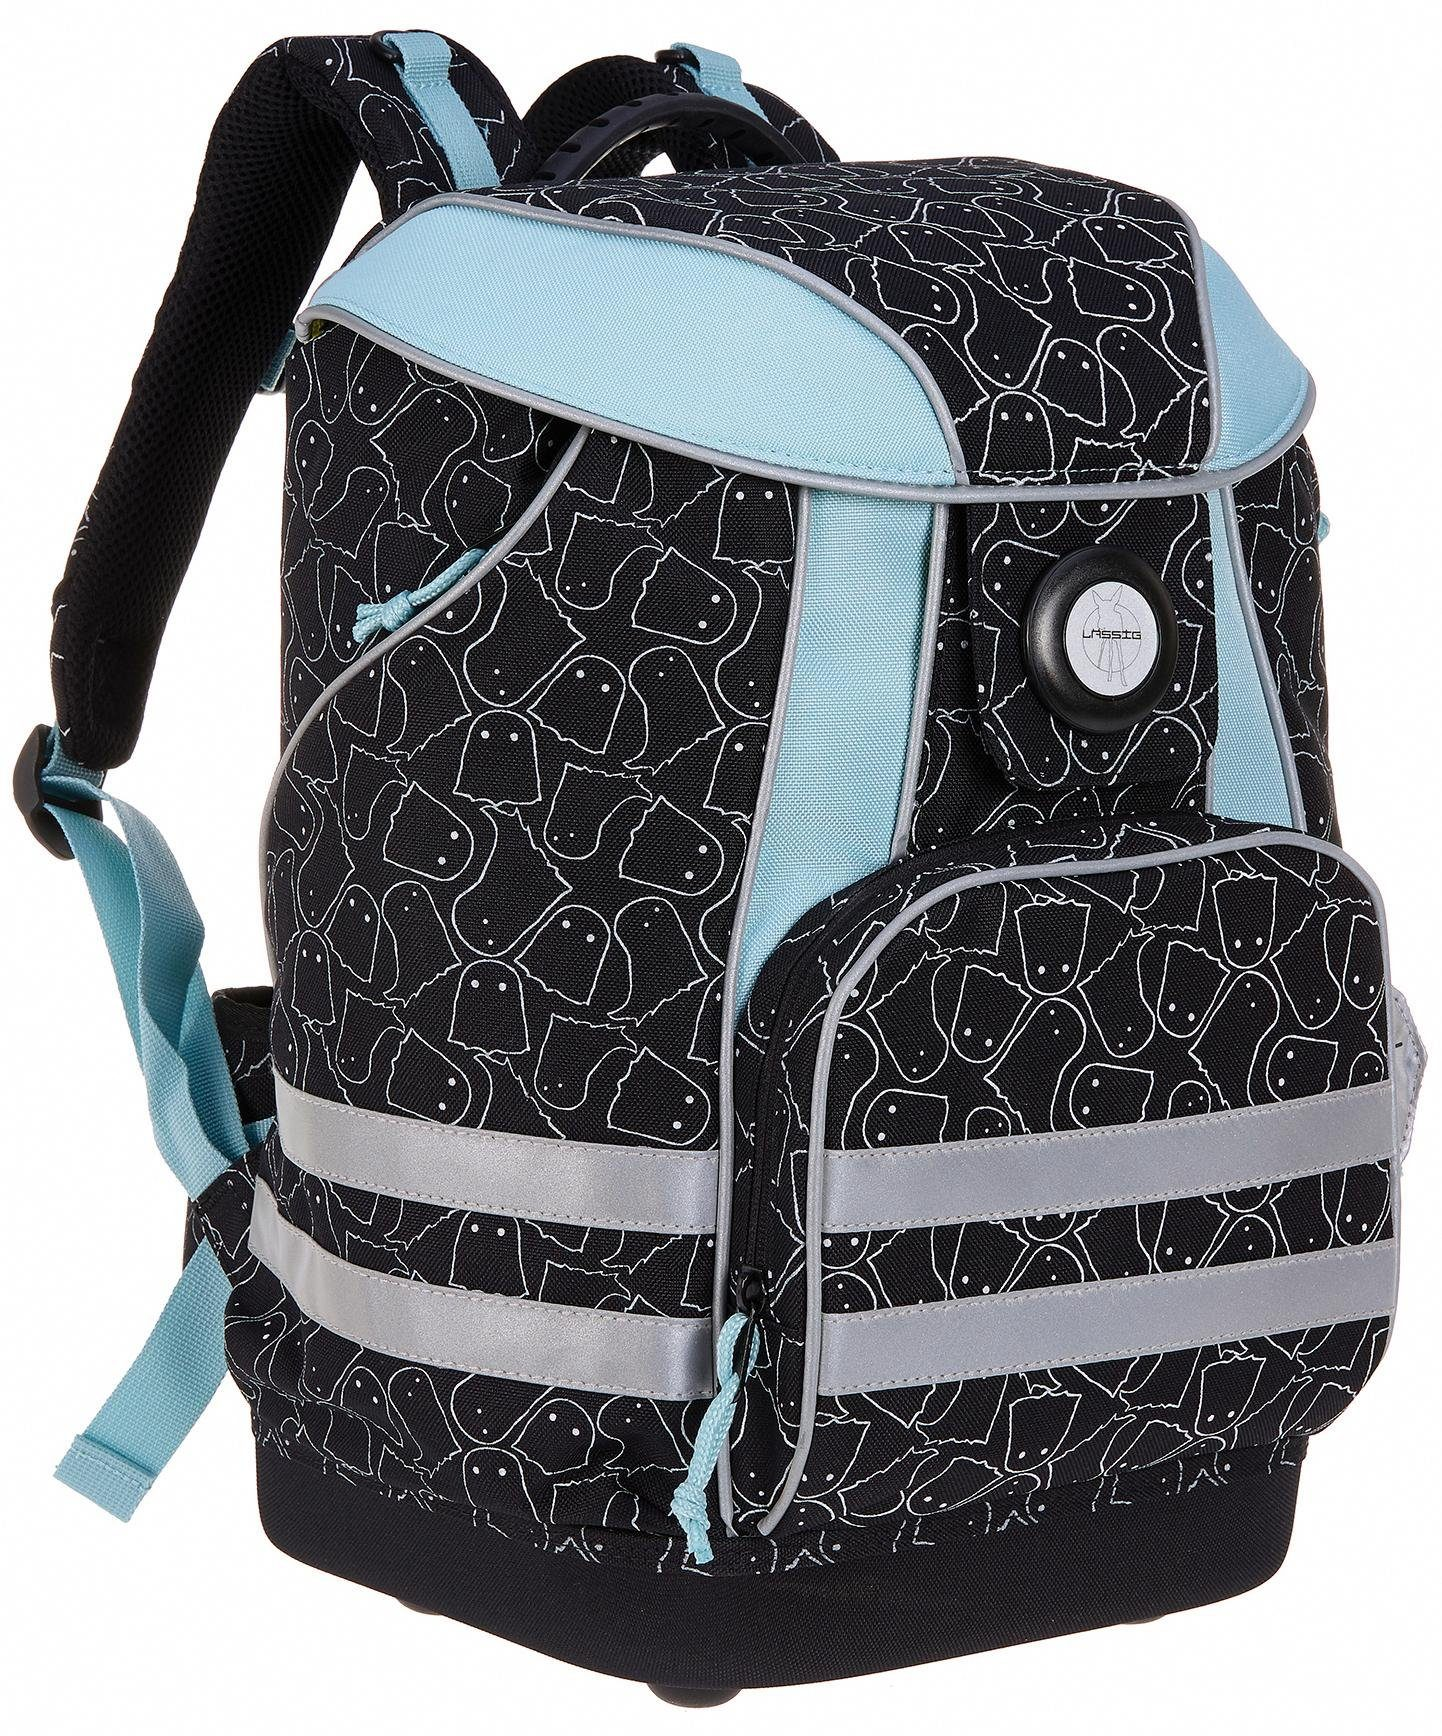 Lässig Schulrucksack, »4Kids School Bag, Spooky Black«